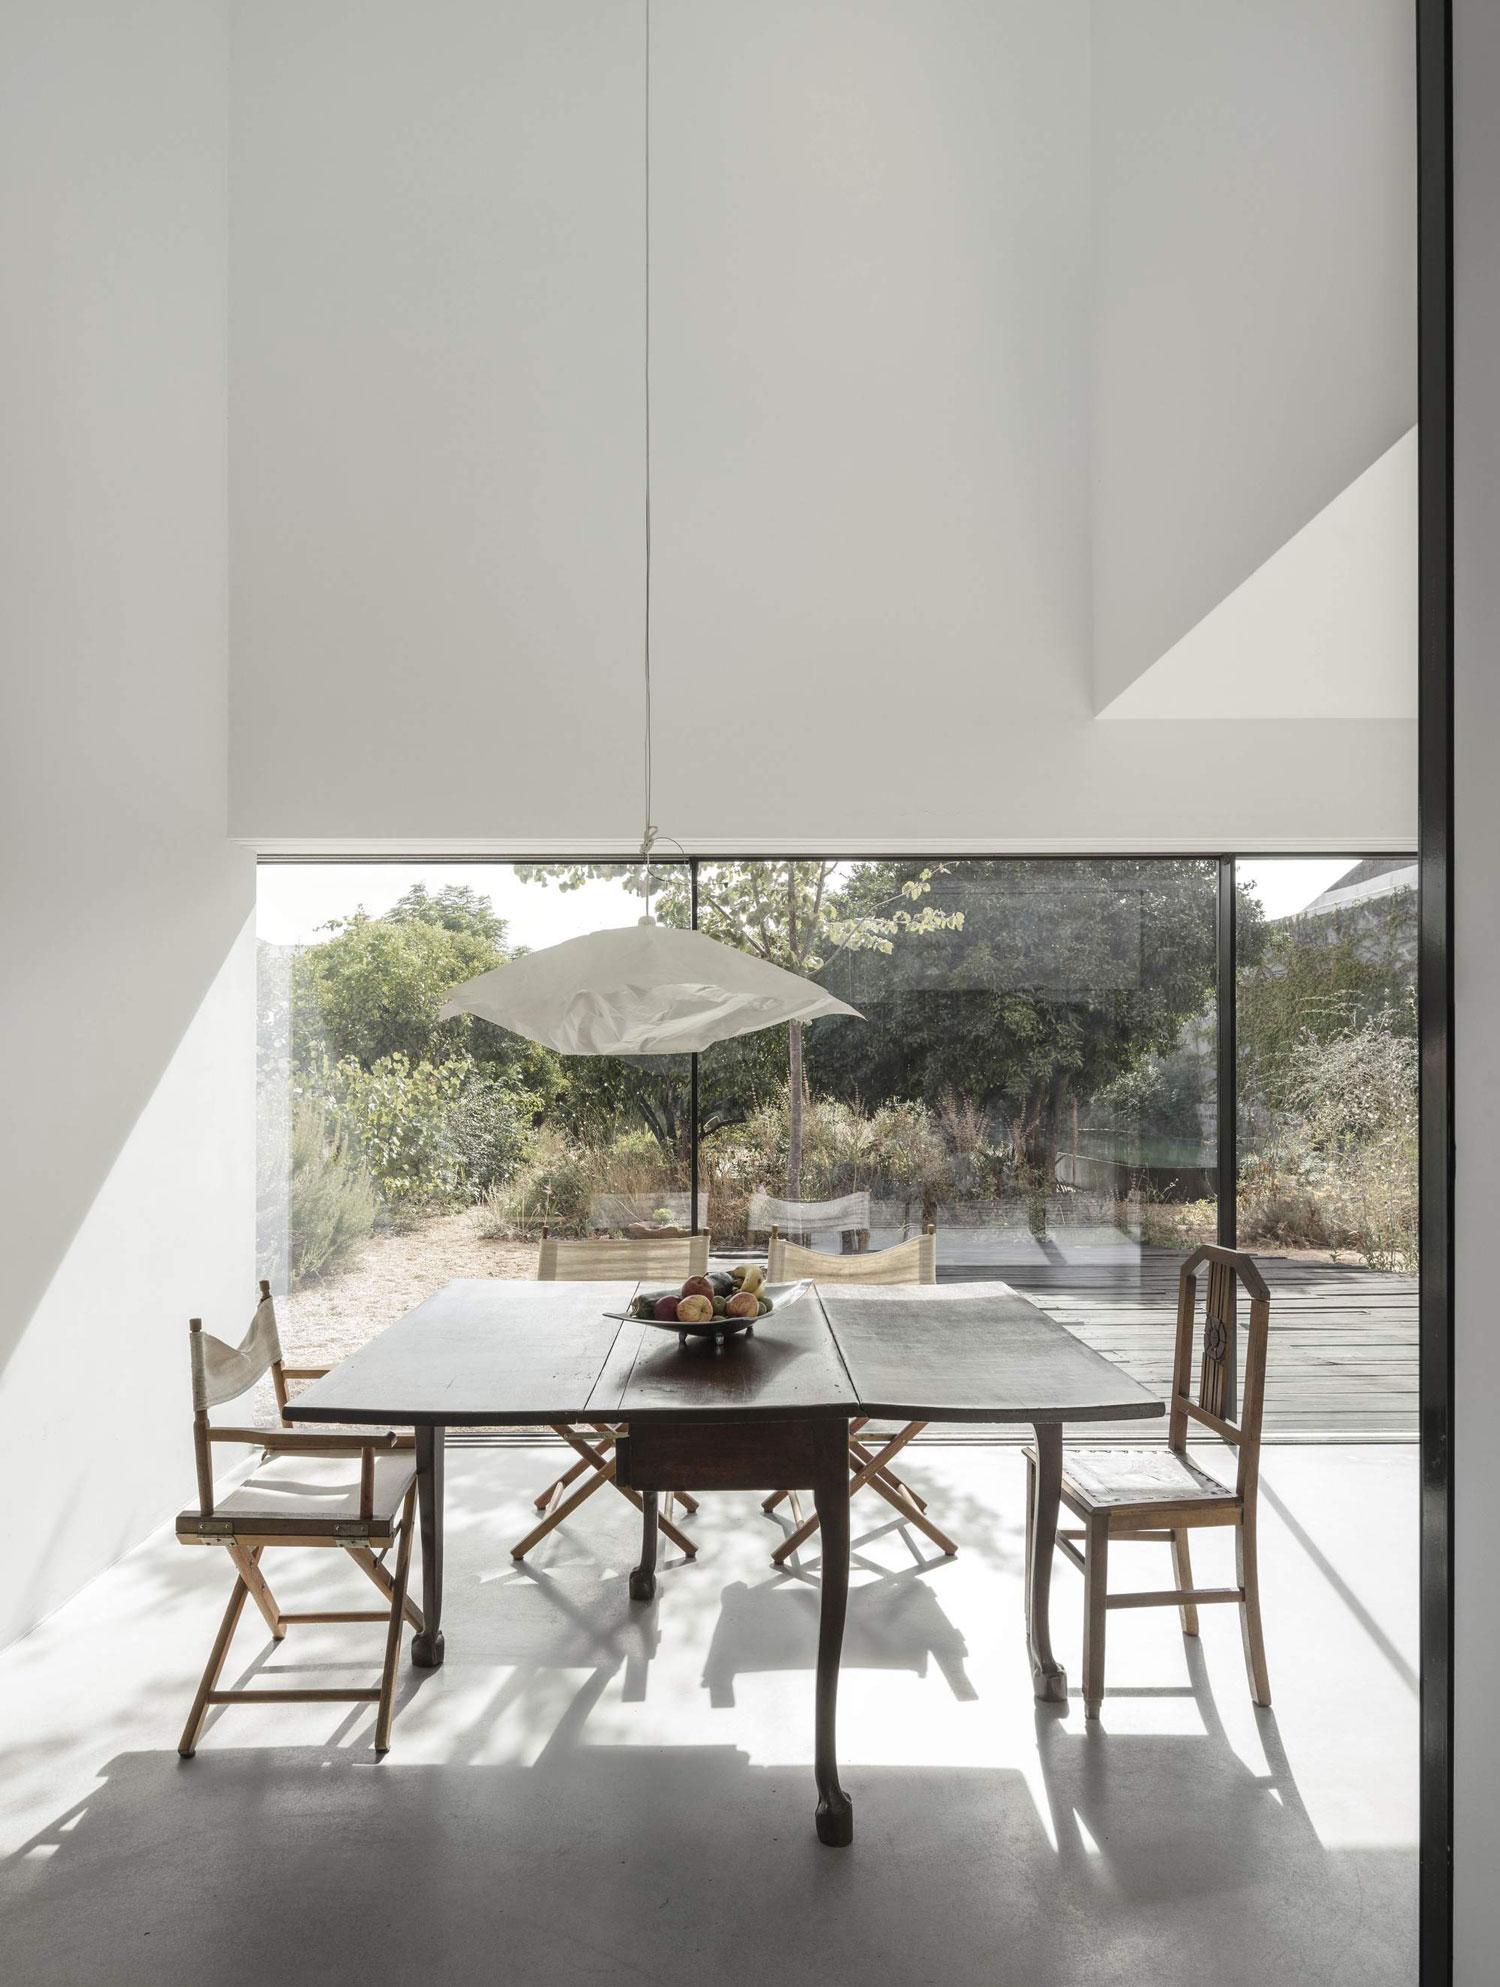 konyhasziget_minimal_haz_portugaliabol_red-house-in-setubal-portugal-by-extrastudio_7.jpg